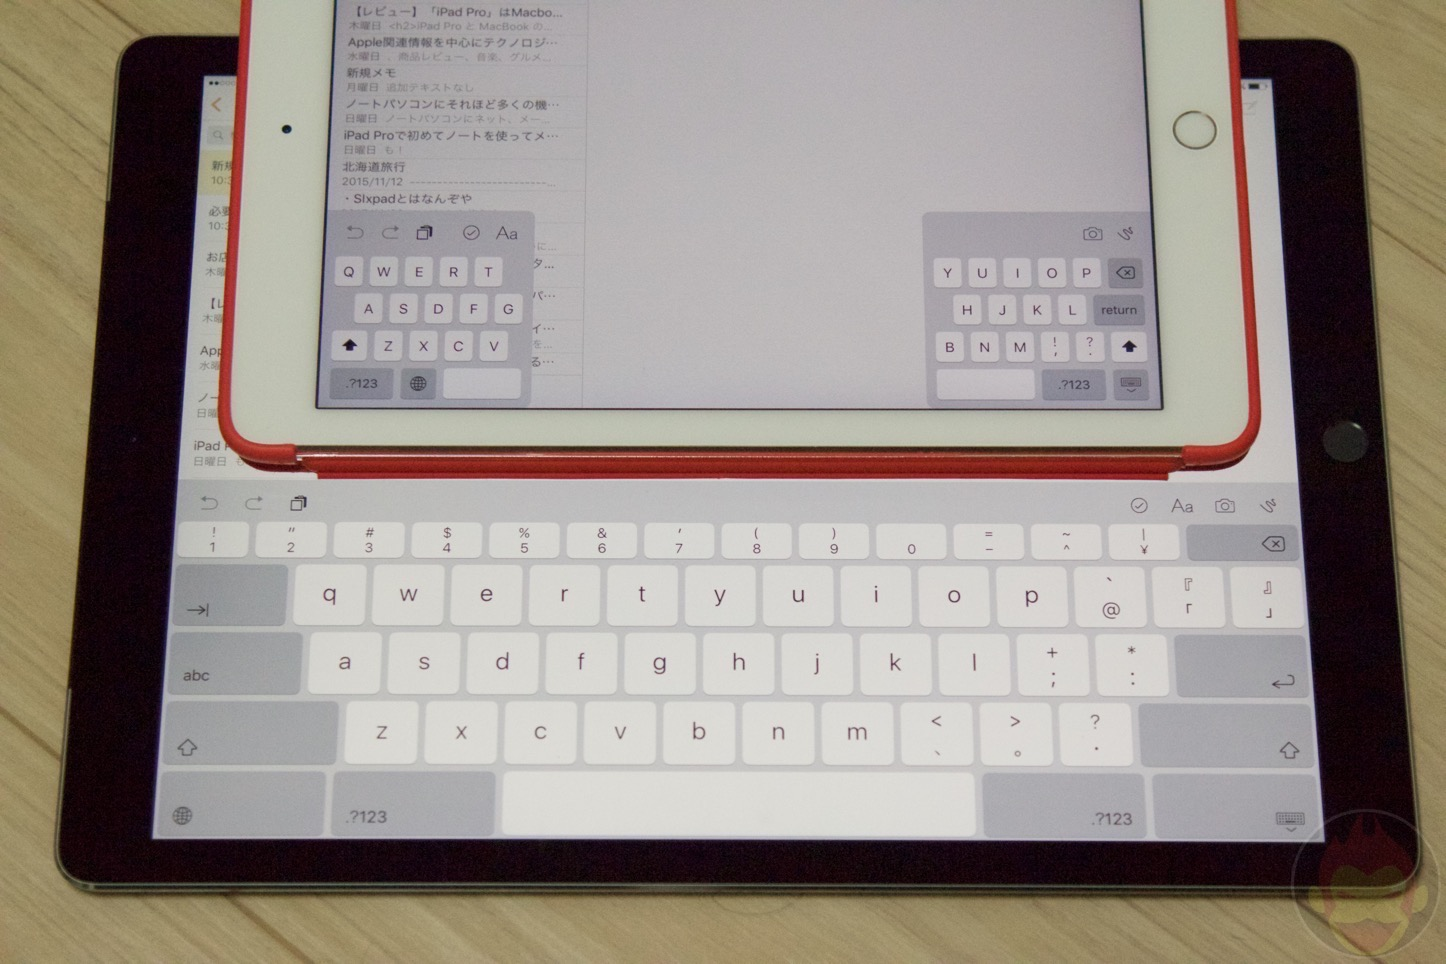 iPad-Pro-in-Depth-Review-08.jpg